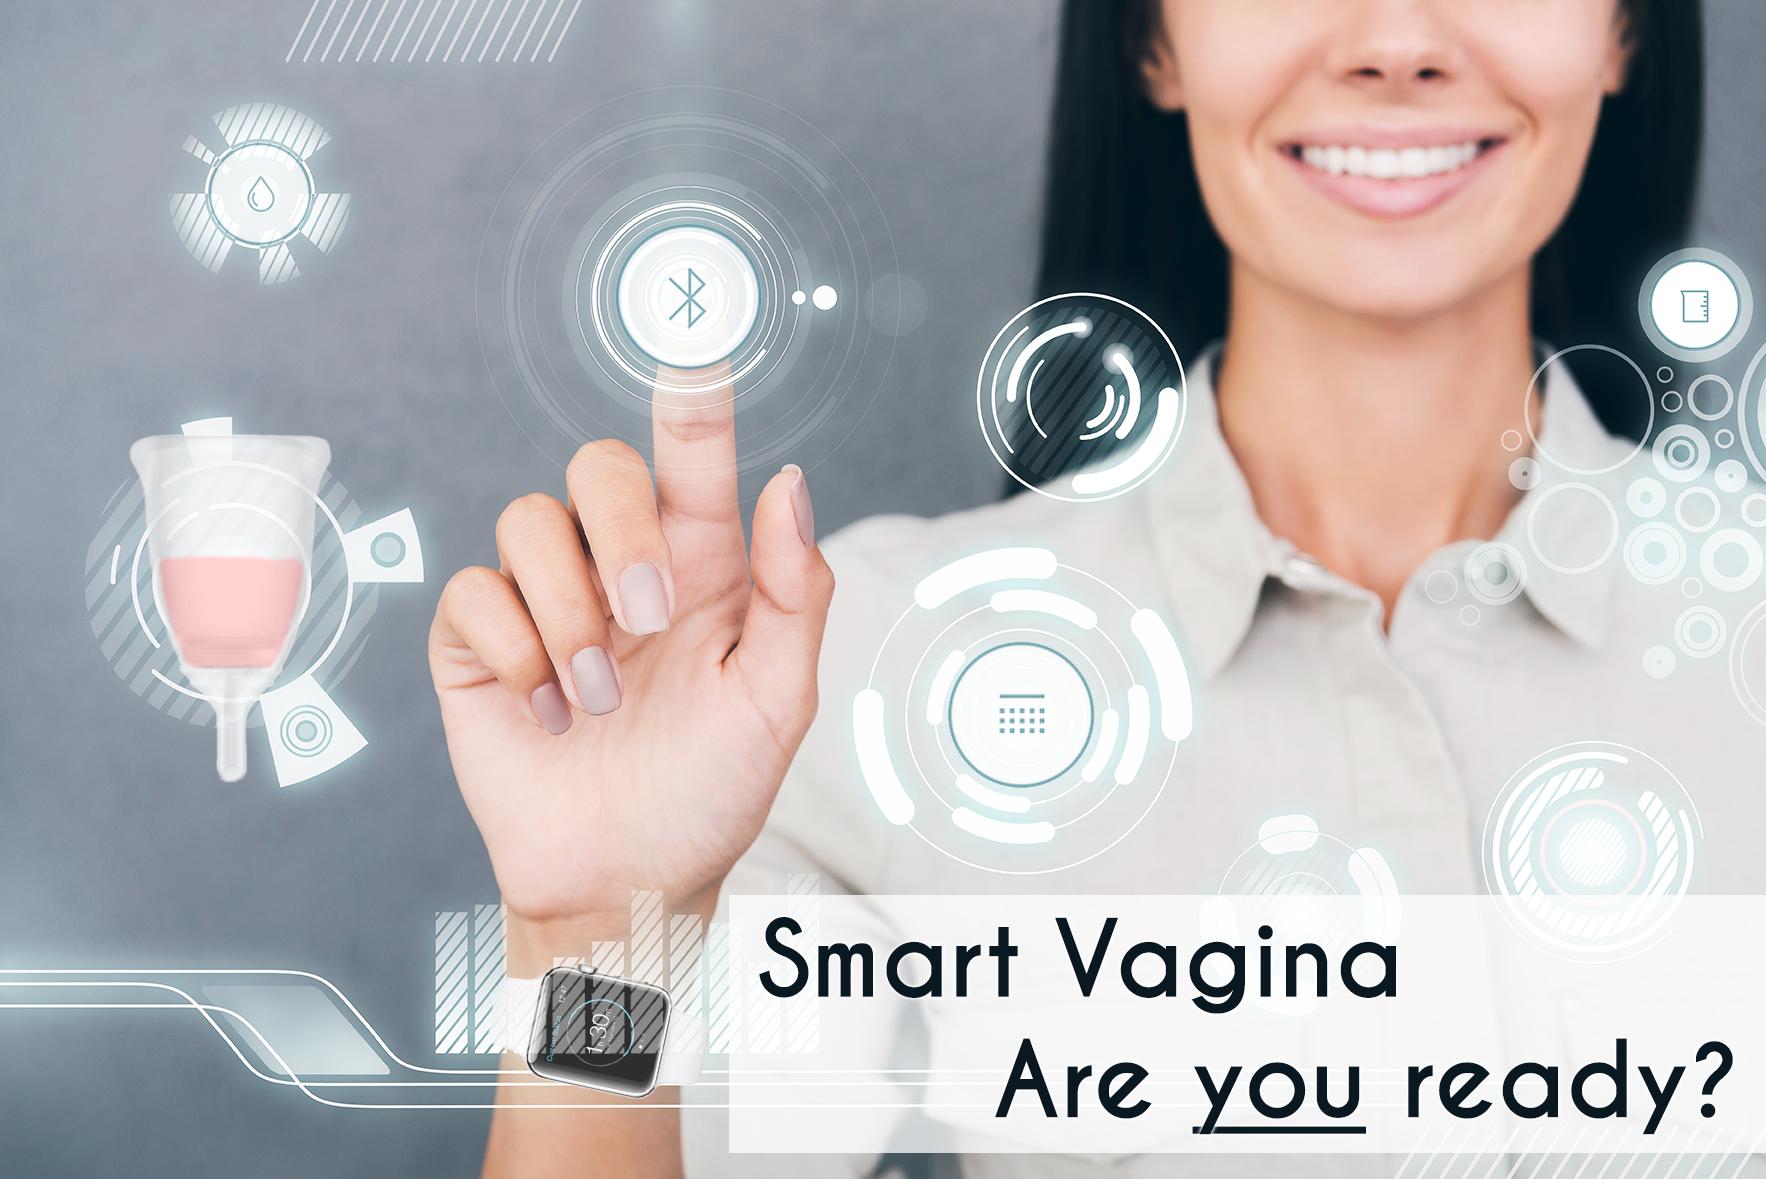 Smart Vagina: Are you ready? #satire